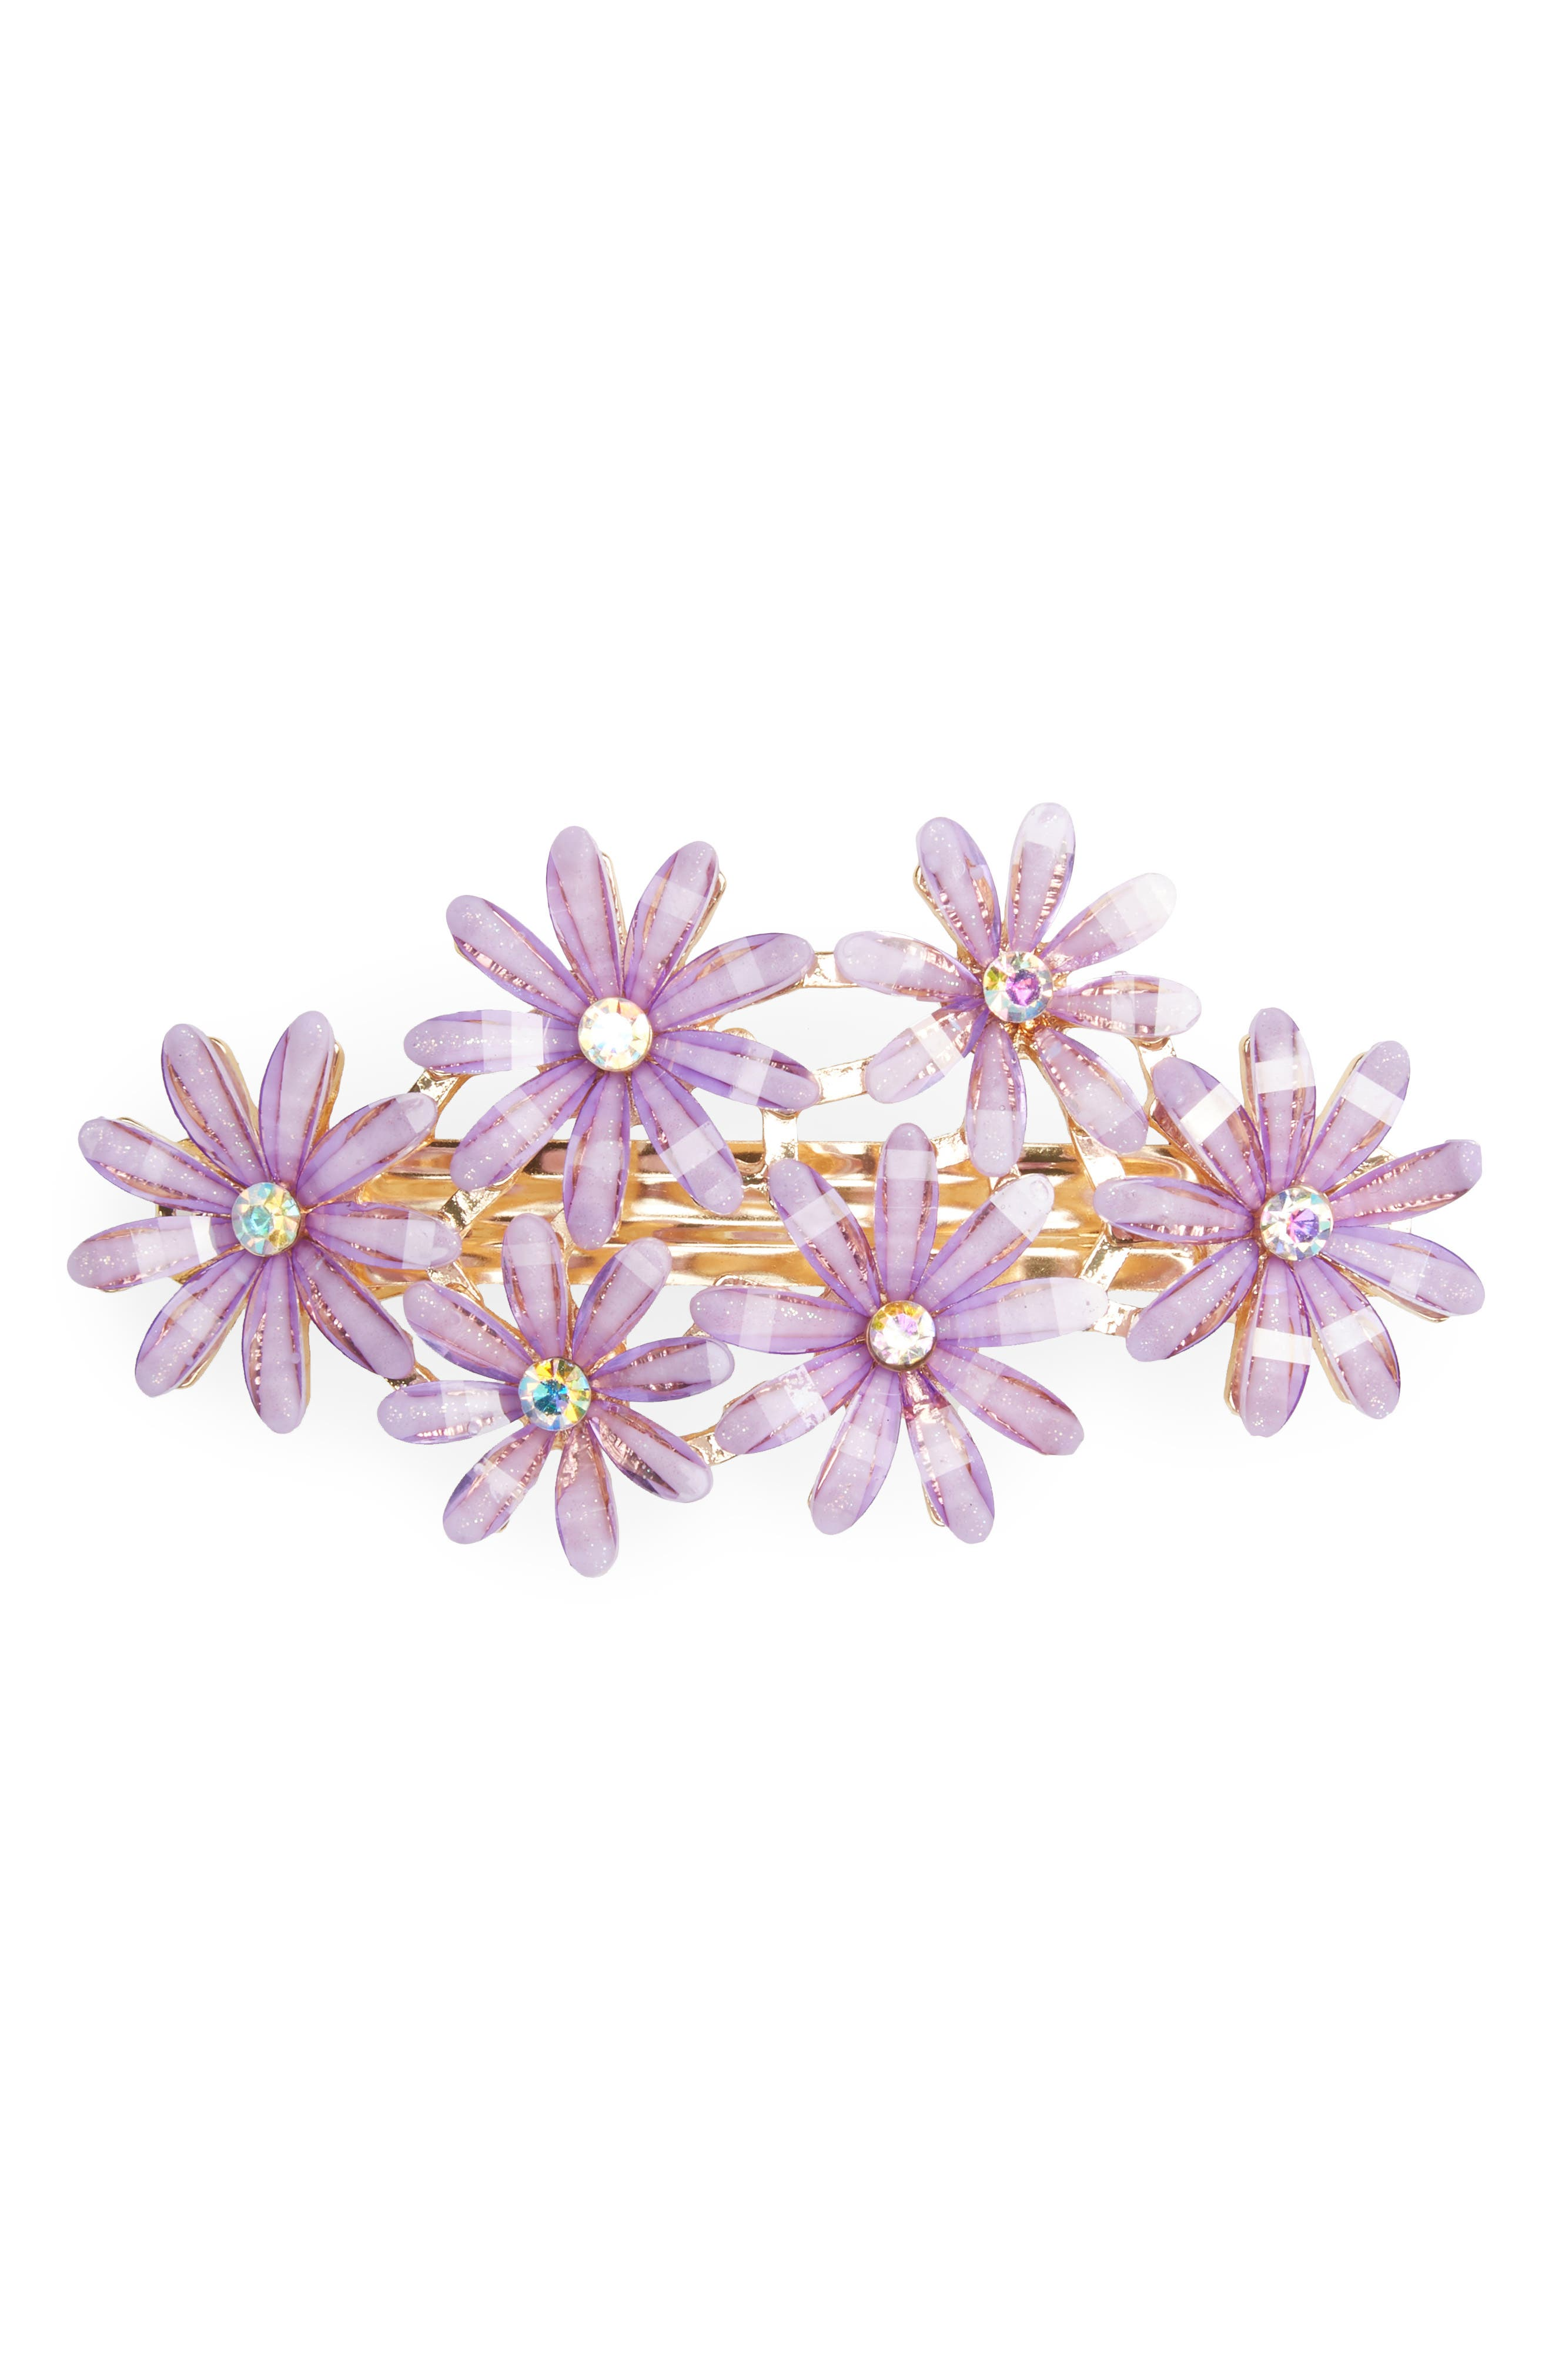 Enamel Flower Barrette,                             Main thumbnail 1, color,                             500